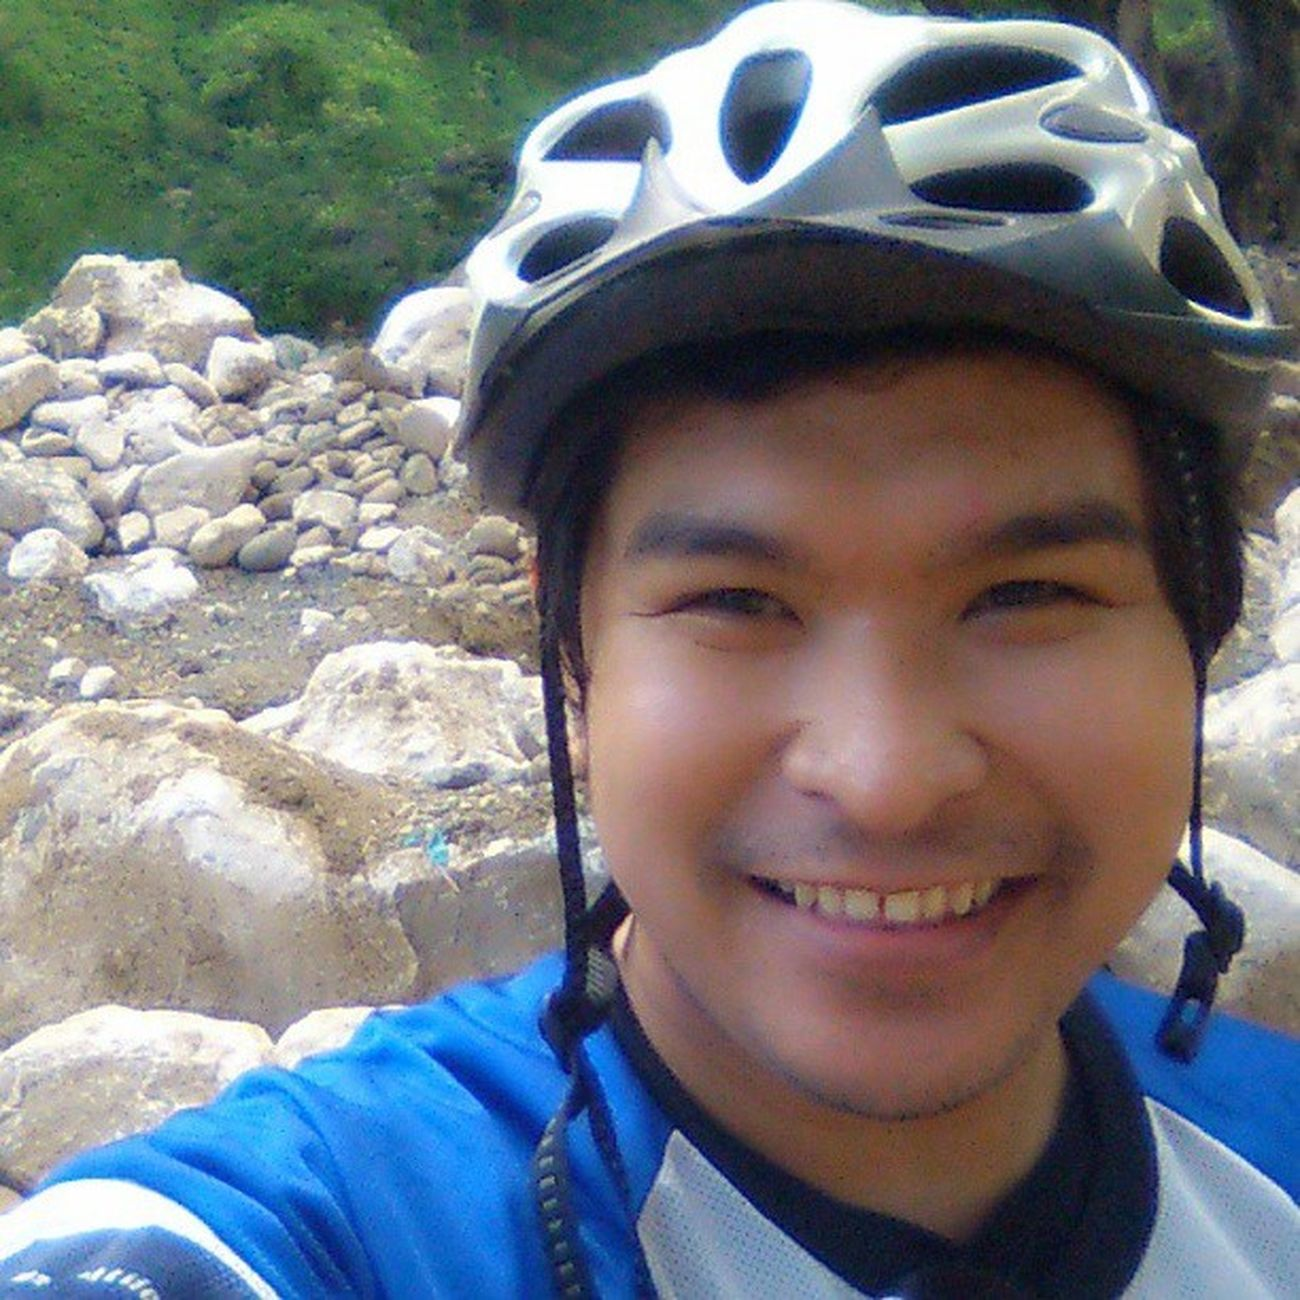 Morningbiking Morning Cyclist Cycling Ryder wawarodriguez ph photooftheday philippines biking